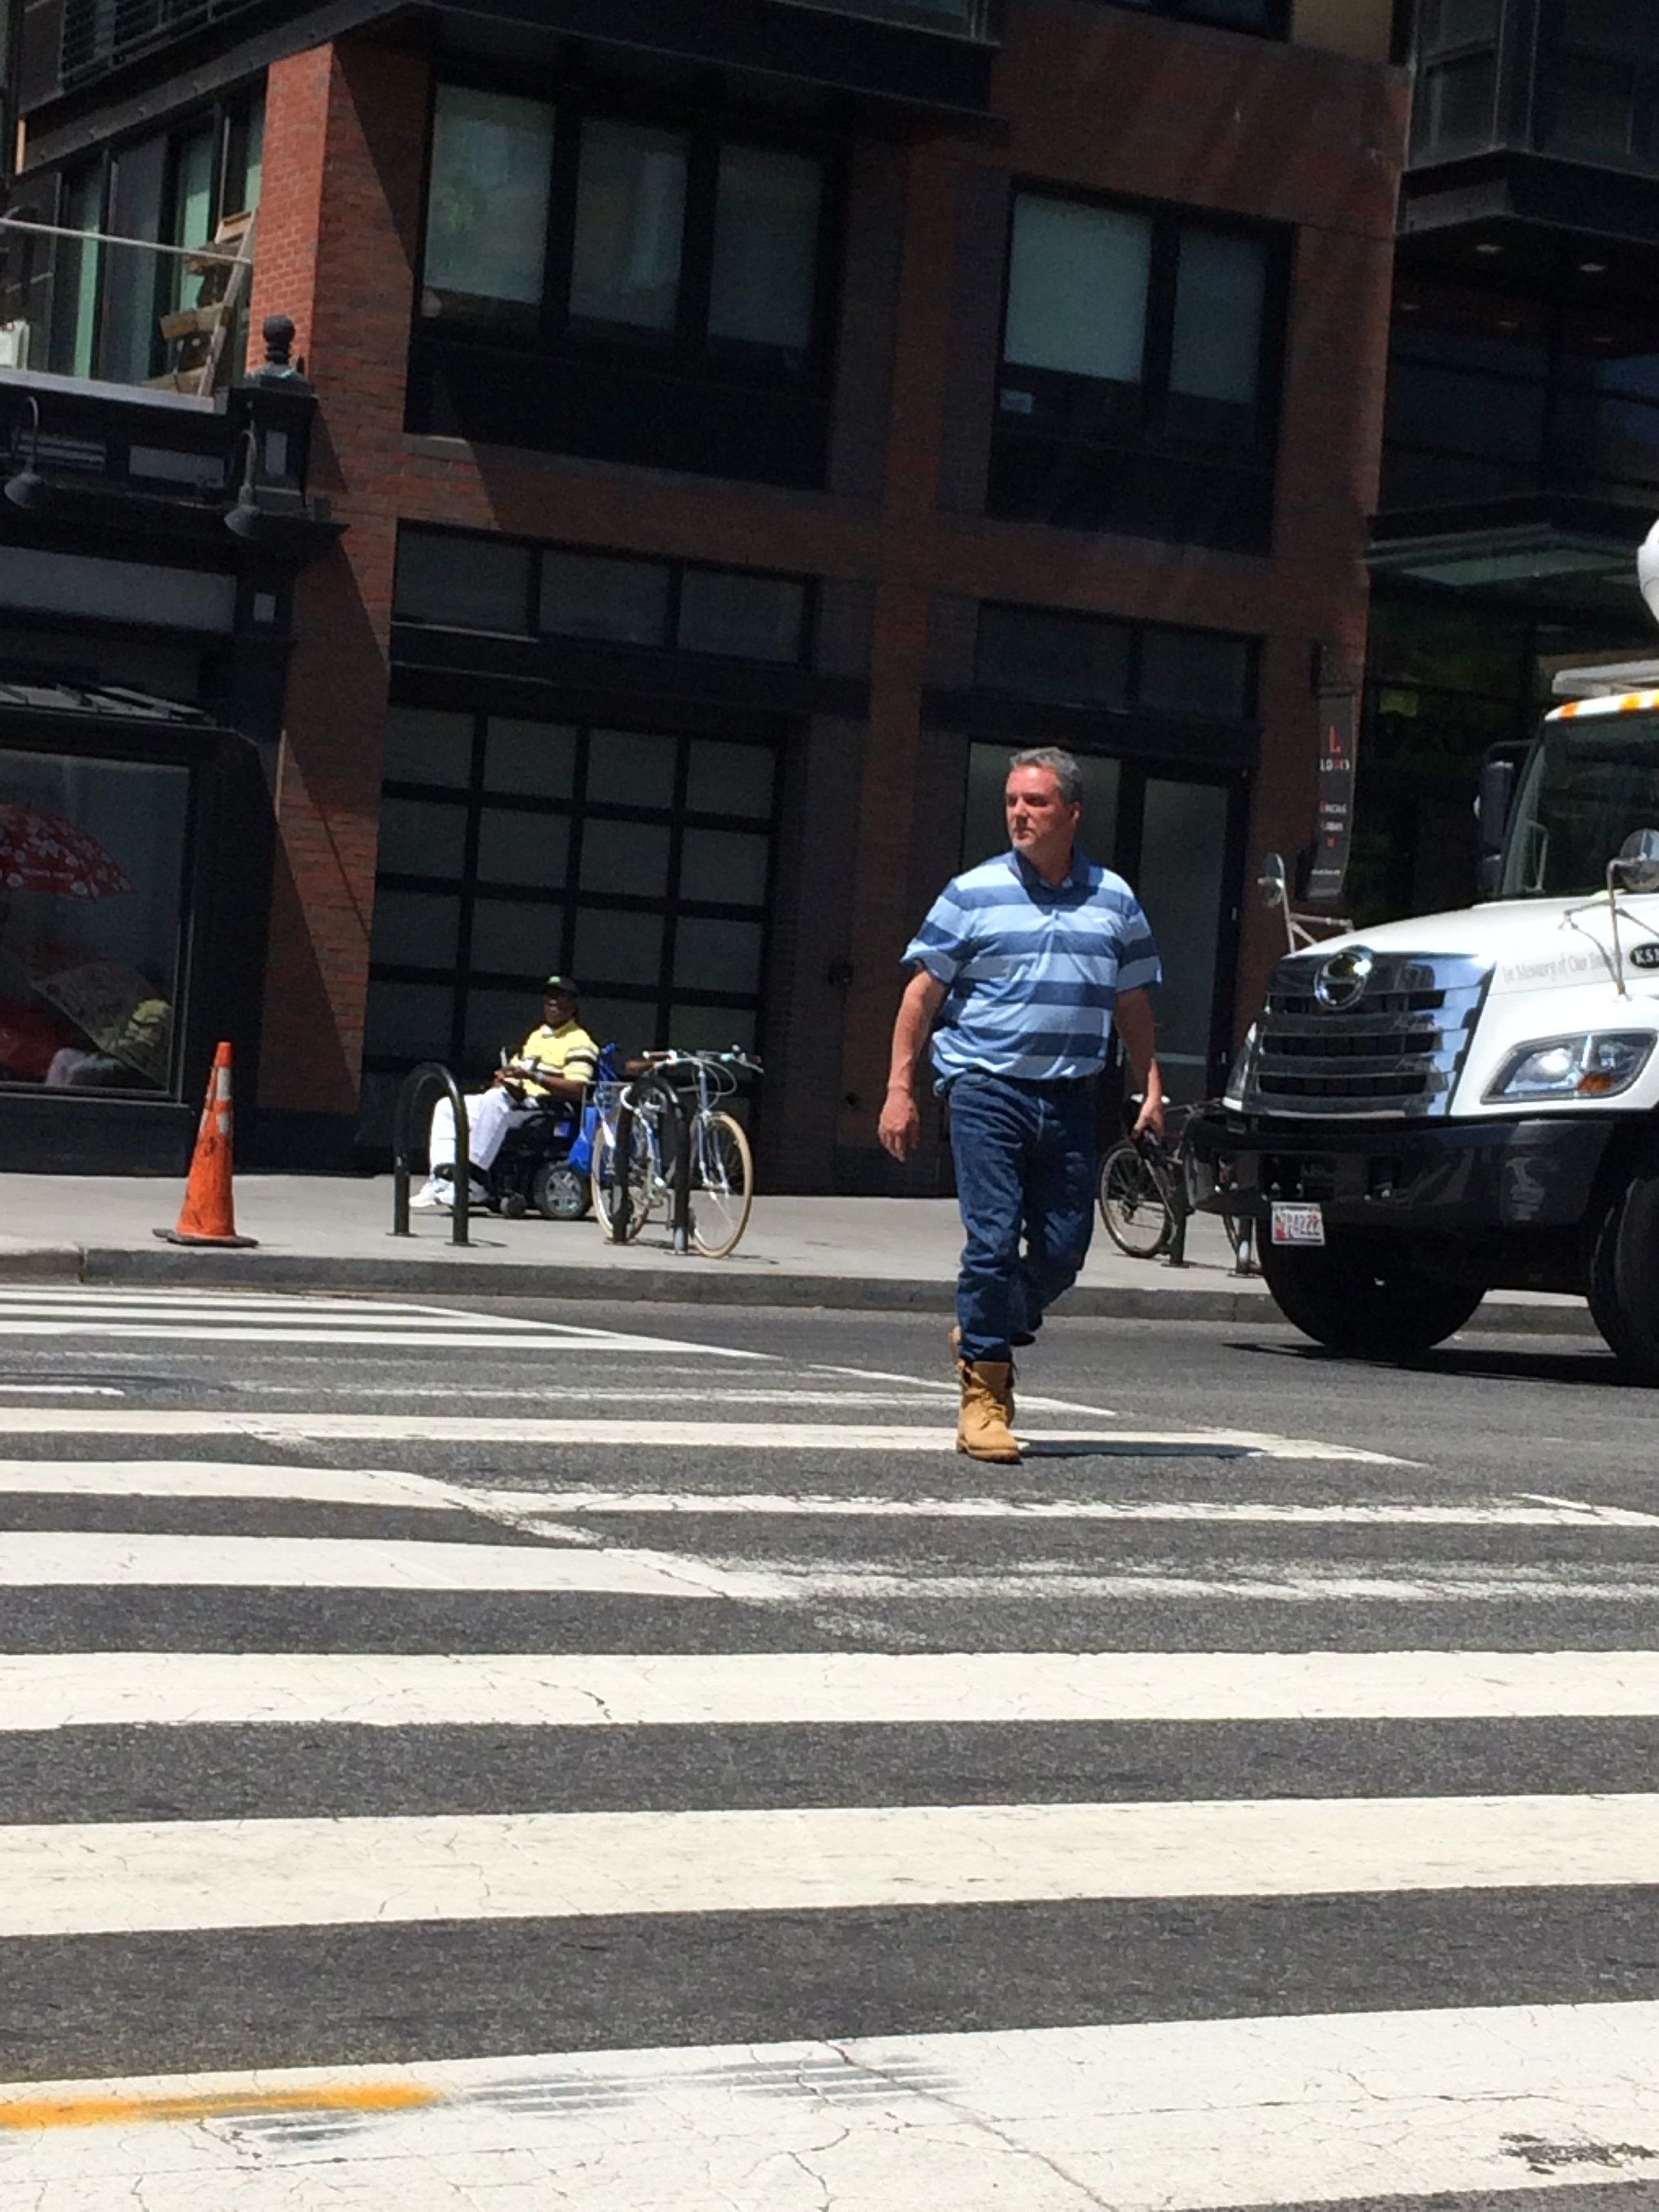 In D.C., a push to halt pedestrian traffic deaths